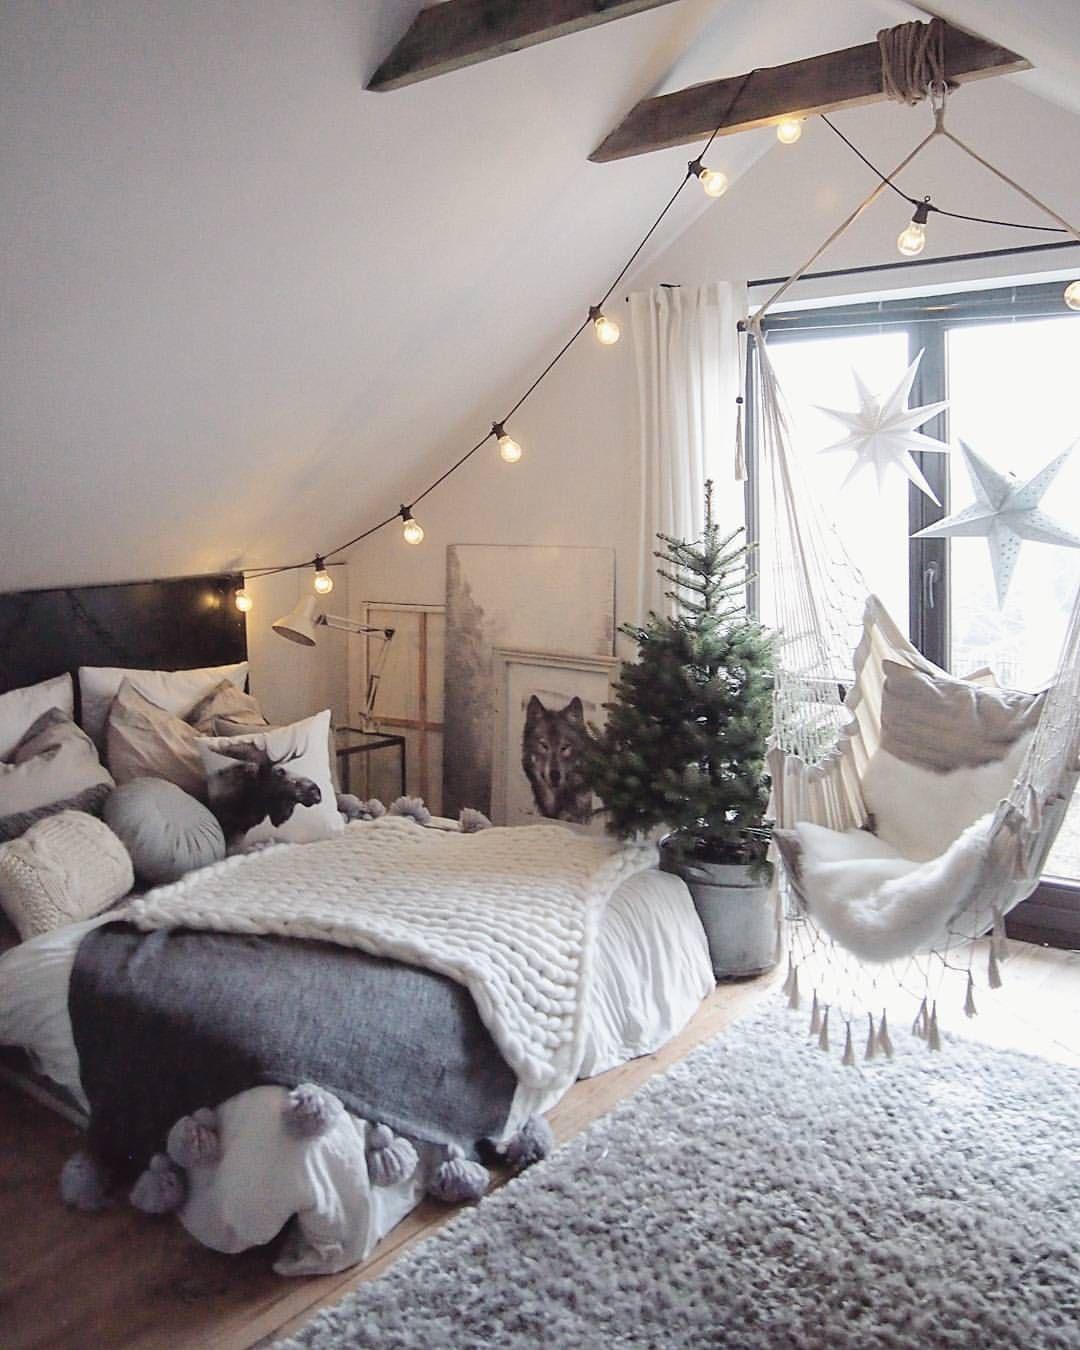 Pin By Zari Kruger On Bedroom Ideas Bedroom Design Dream